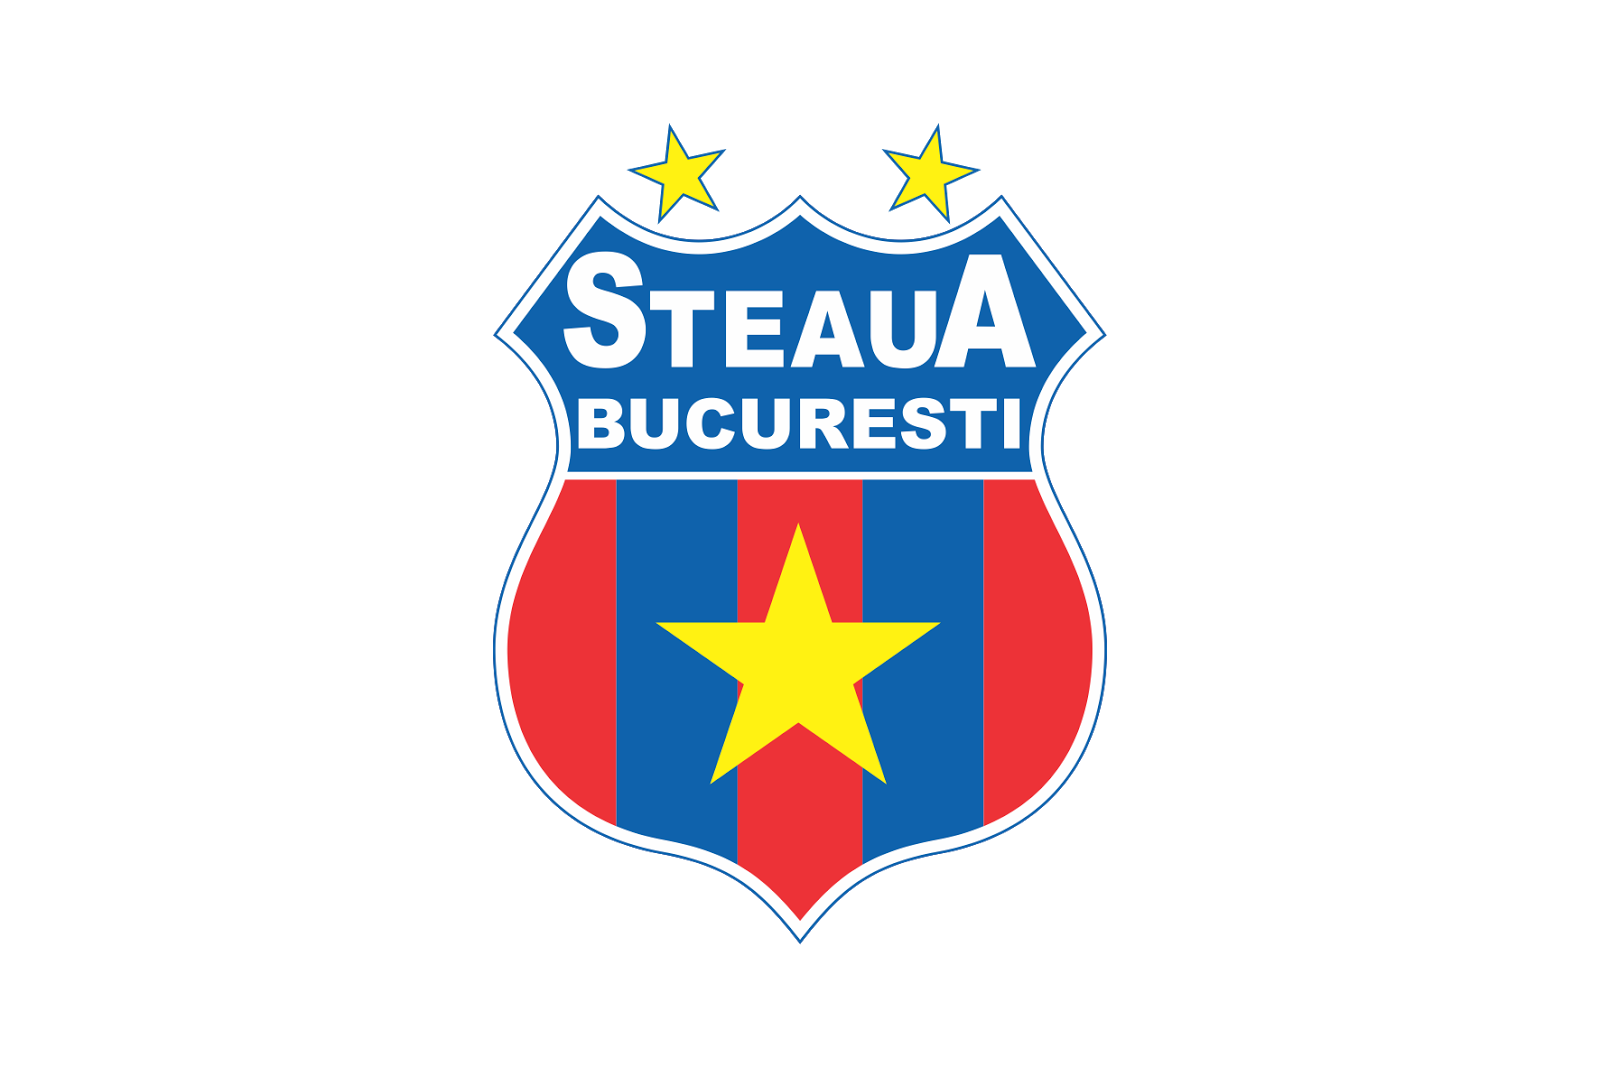 steaua bucuresti logo